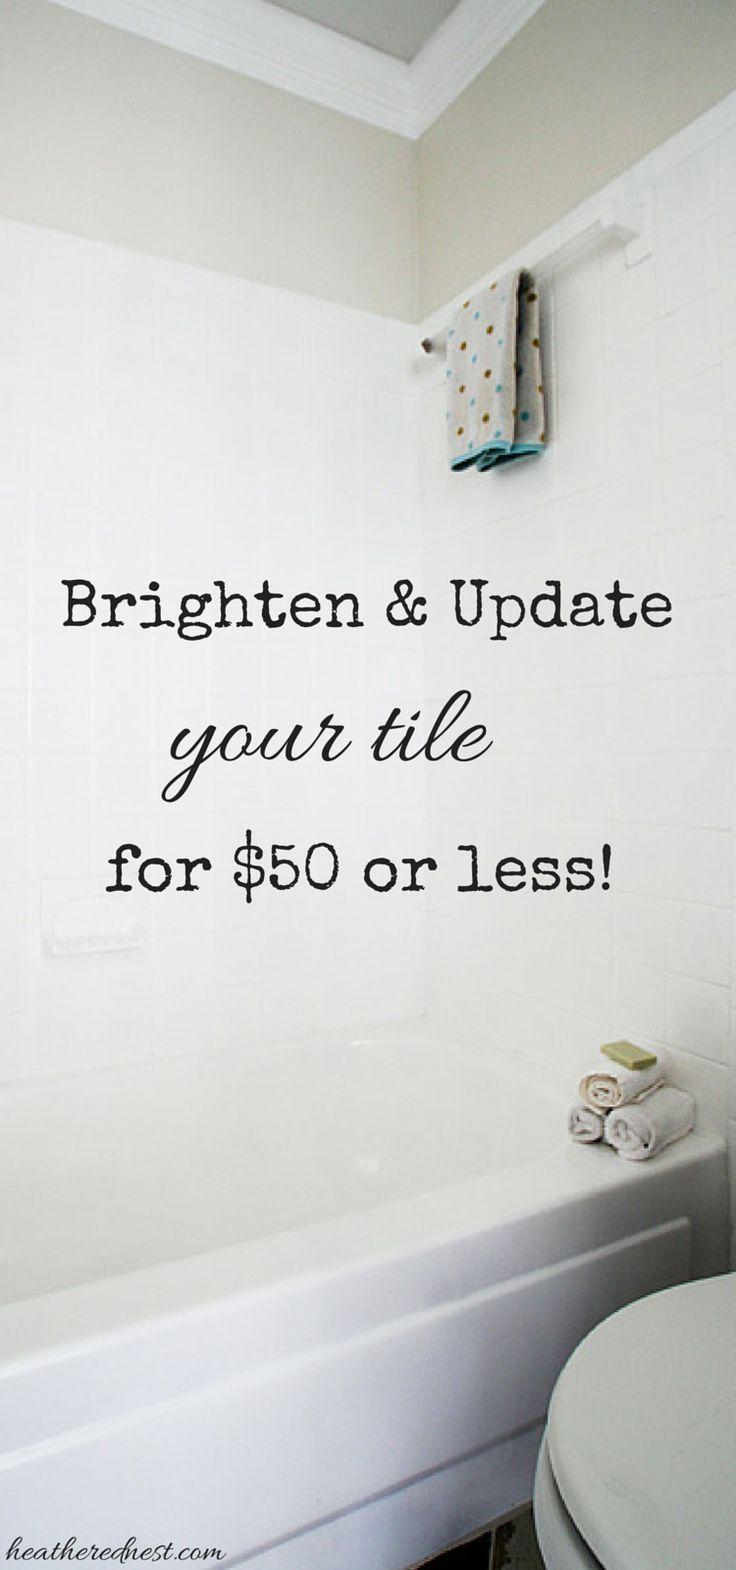 Best 25+ Can you paint tile ideas on Pinterest   Painting tiles ...